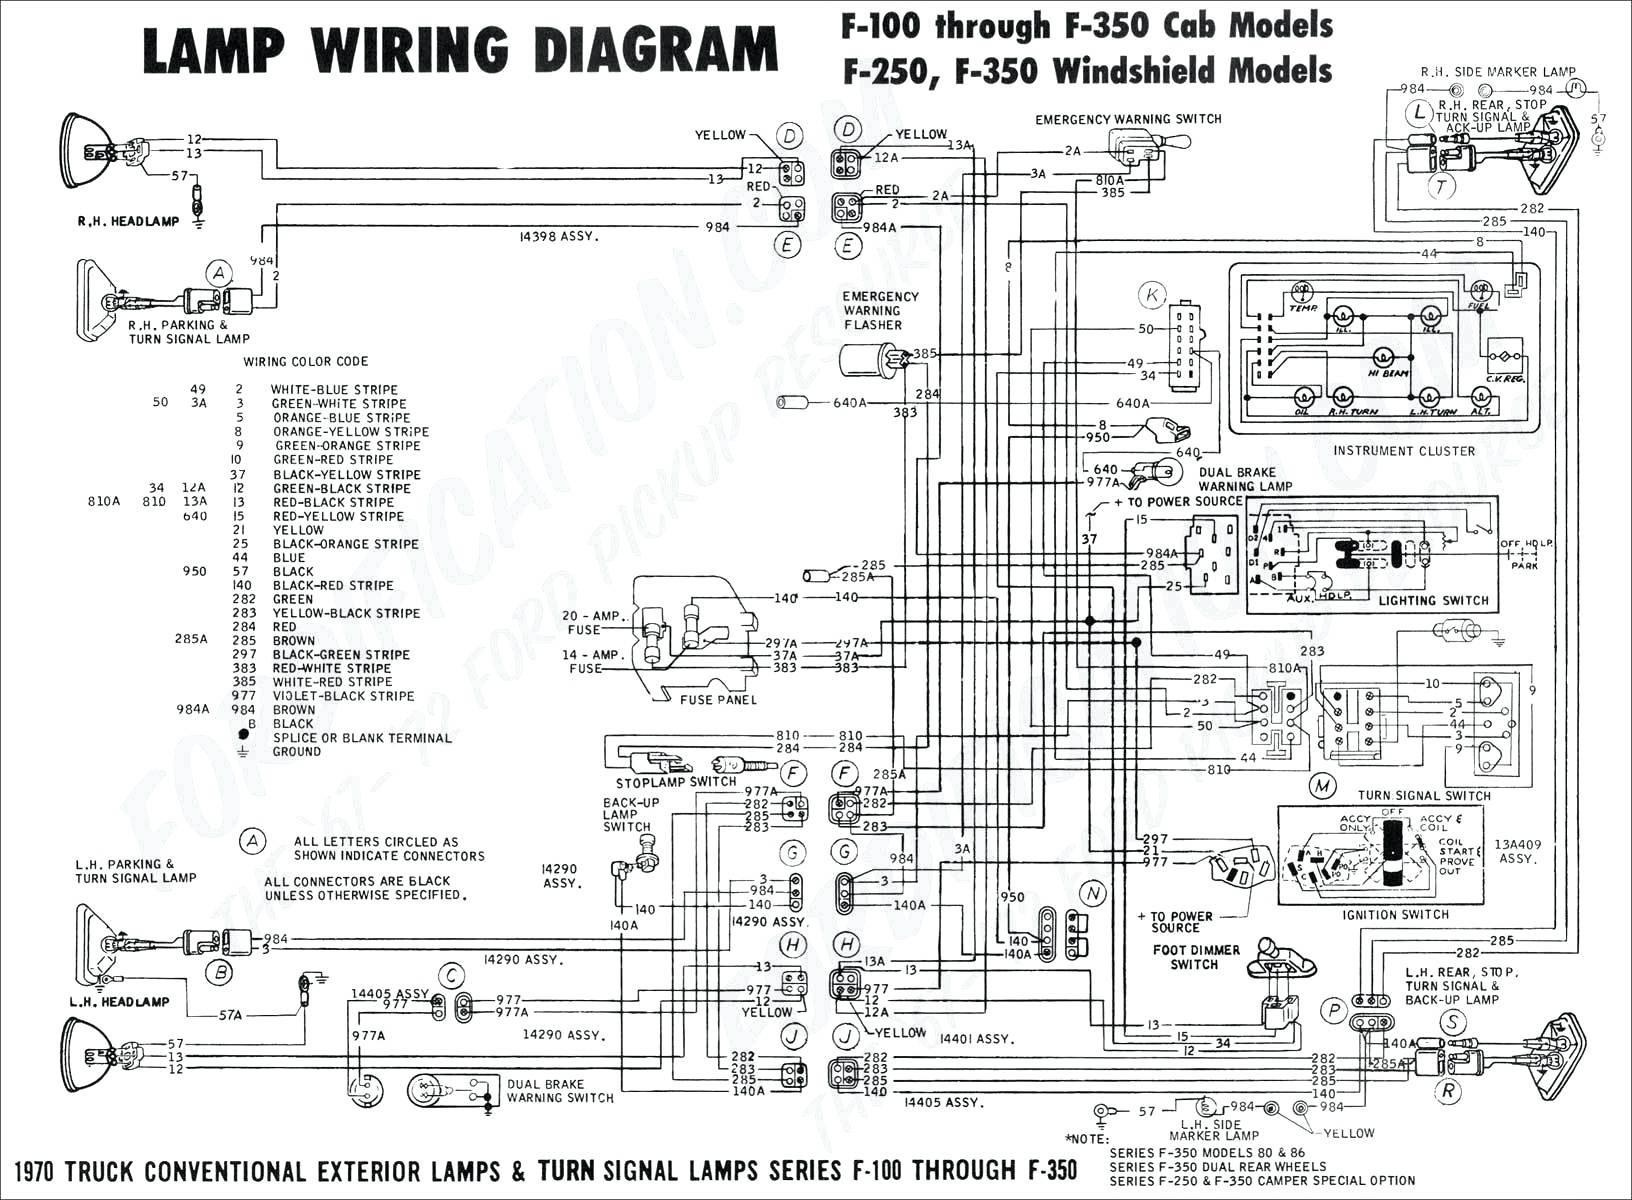 2005 chevrolet equinox wiring diagram fb 5635  wire o2 sensor wiring diagram on chevrolet silverado o2  fb 5635  wire o2 sensor wiring diagram